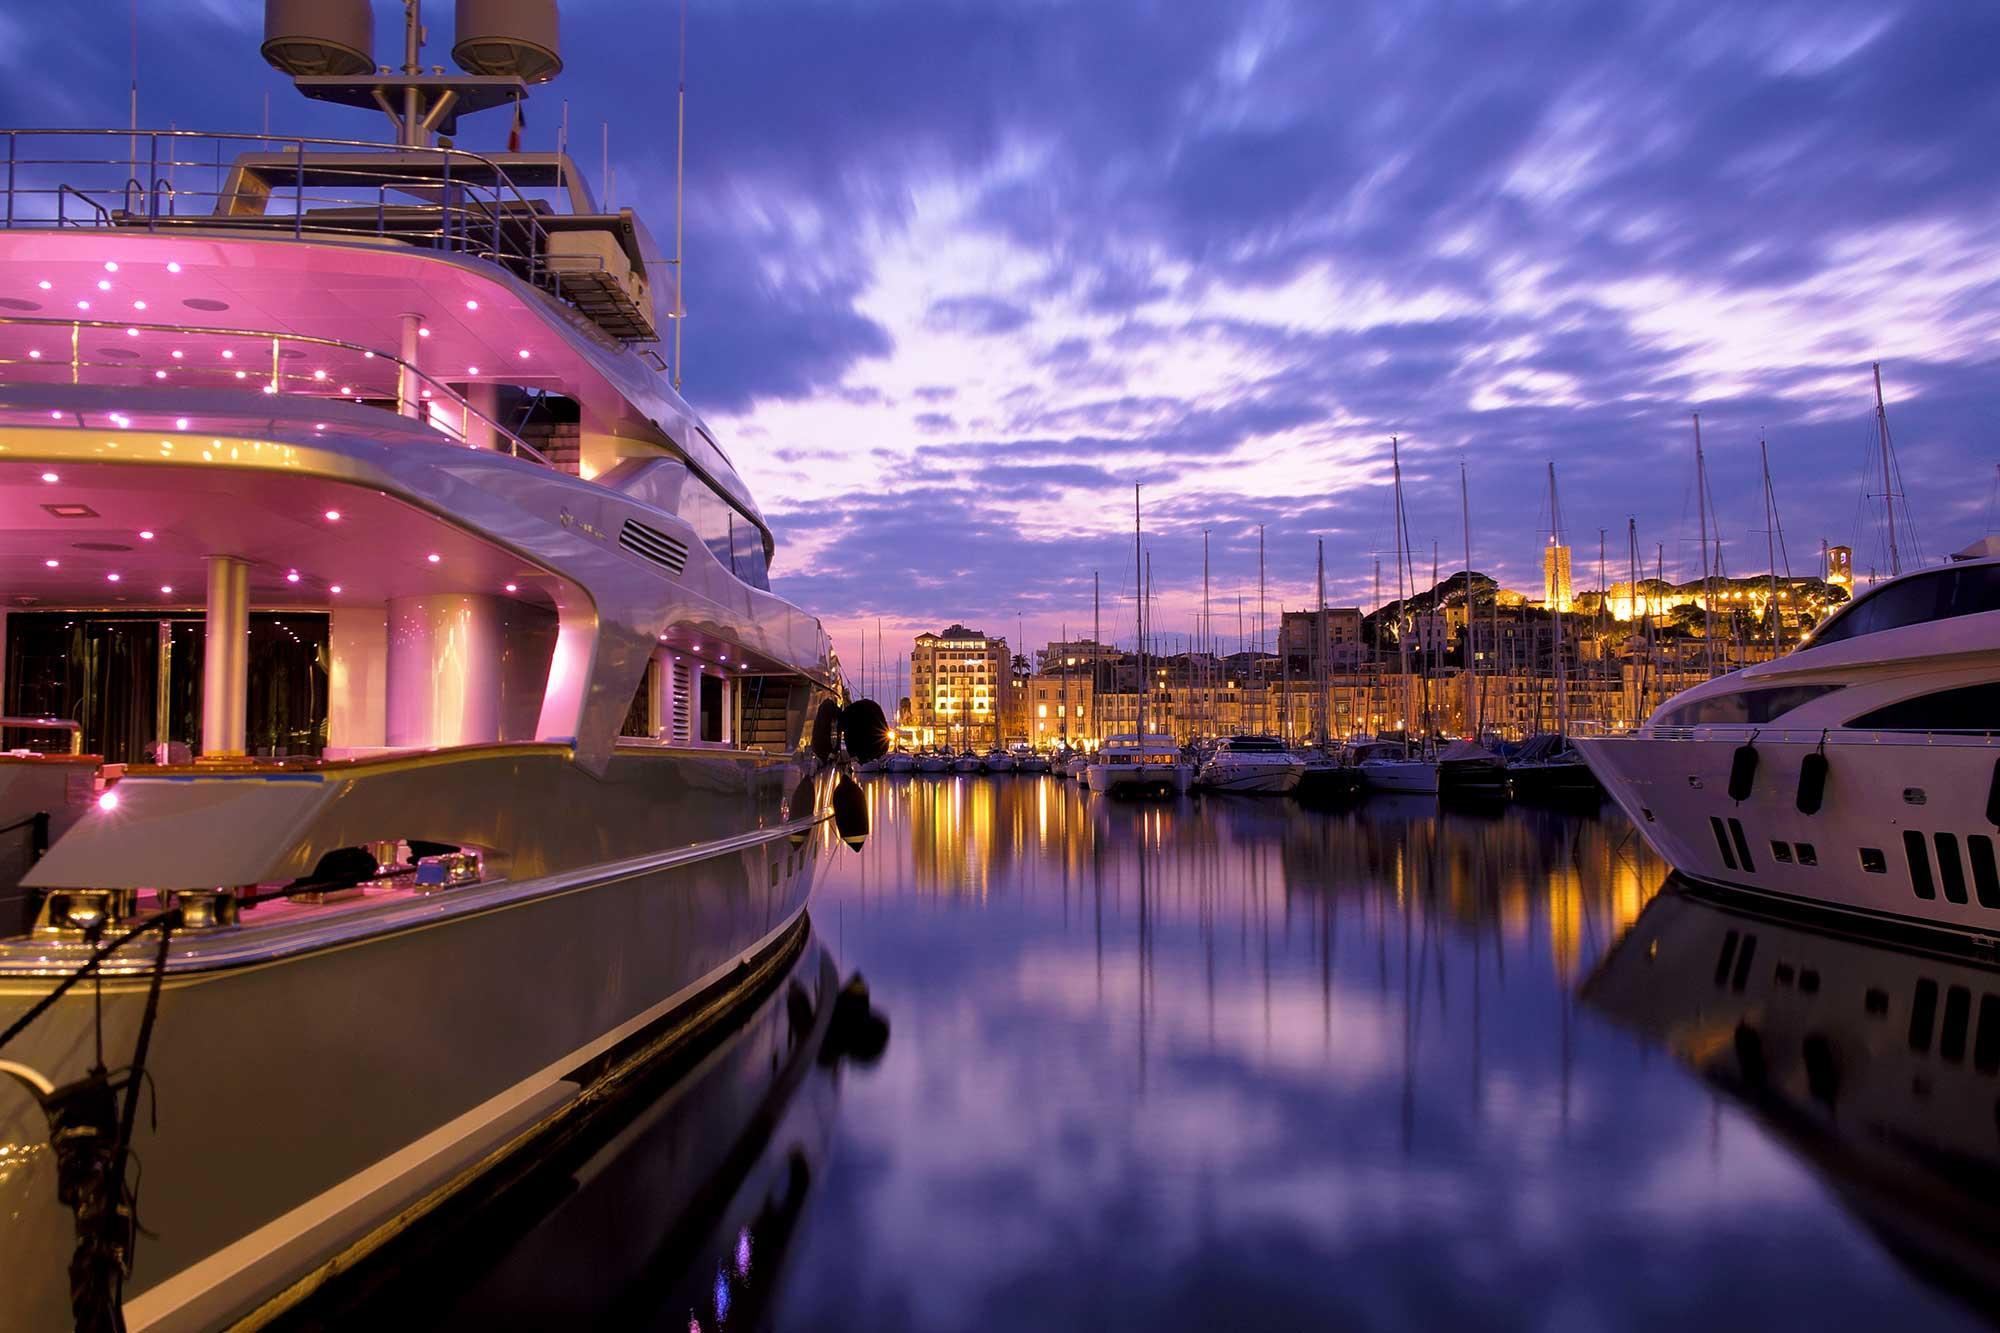 Oferta Viaje a Cannes